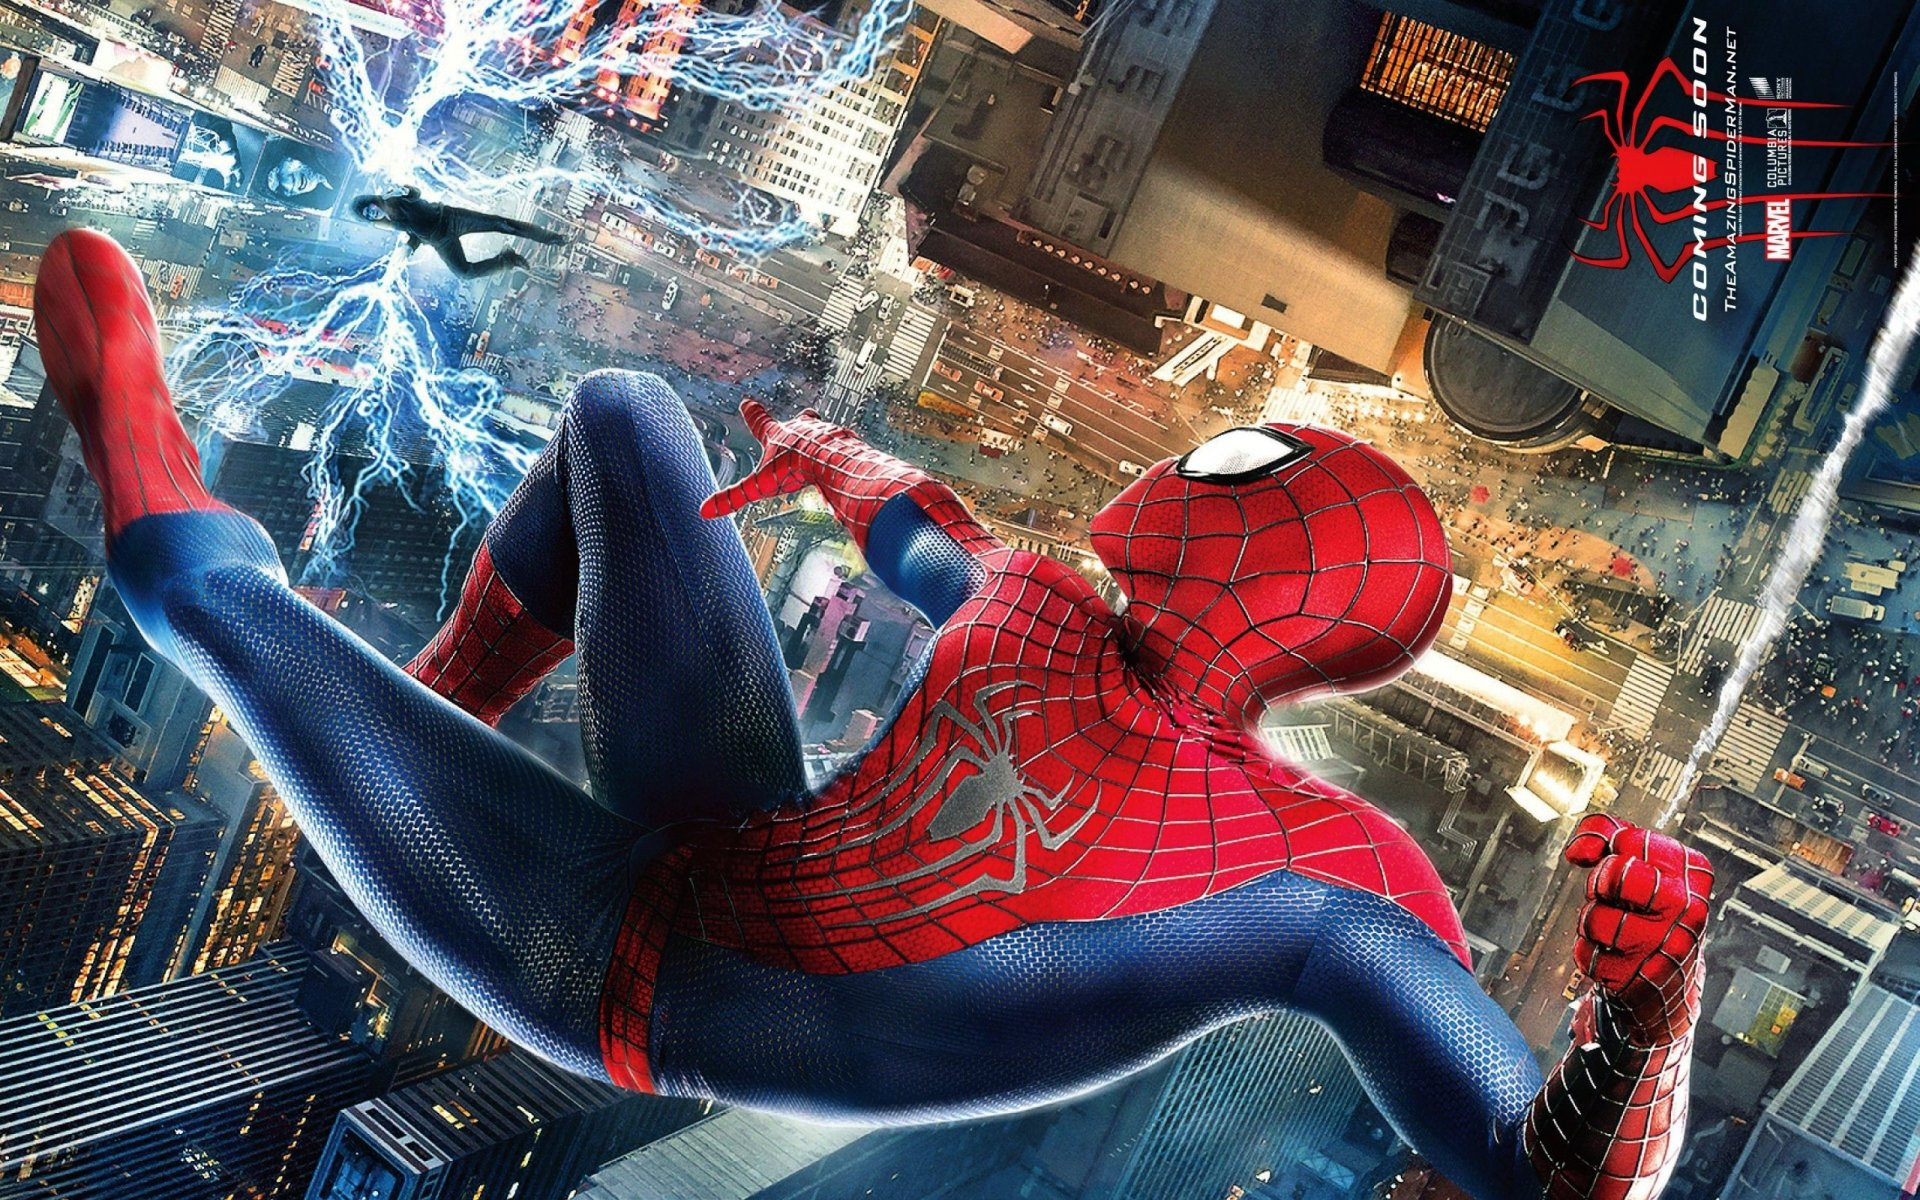 Amazing Spider Man 2 Action Adventure Fantasy Comics Movie Spider